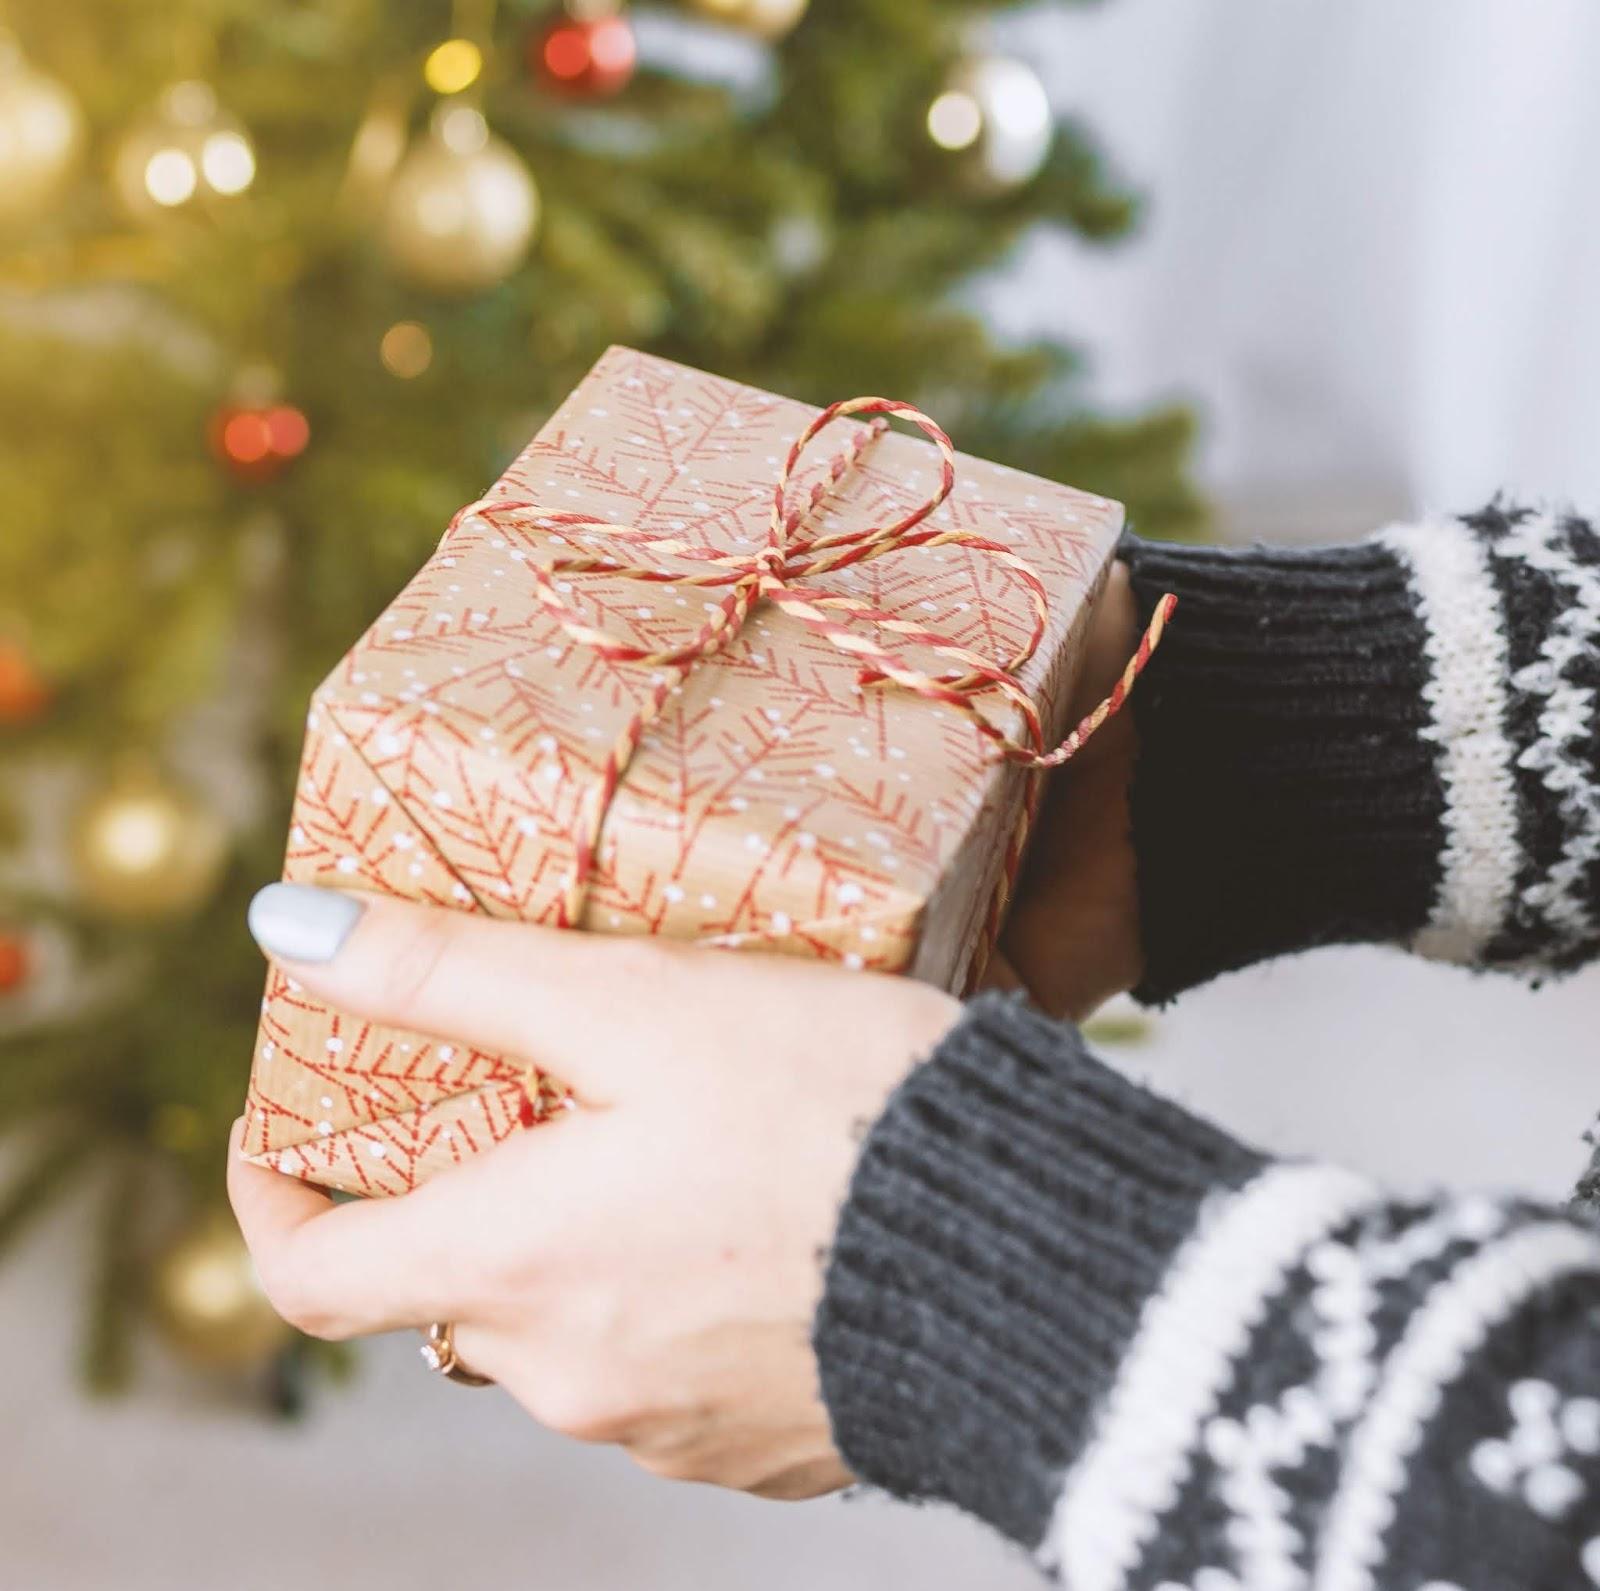 Merry Christmas Gift DP